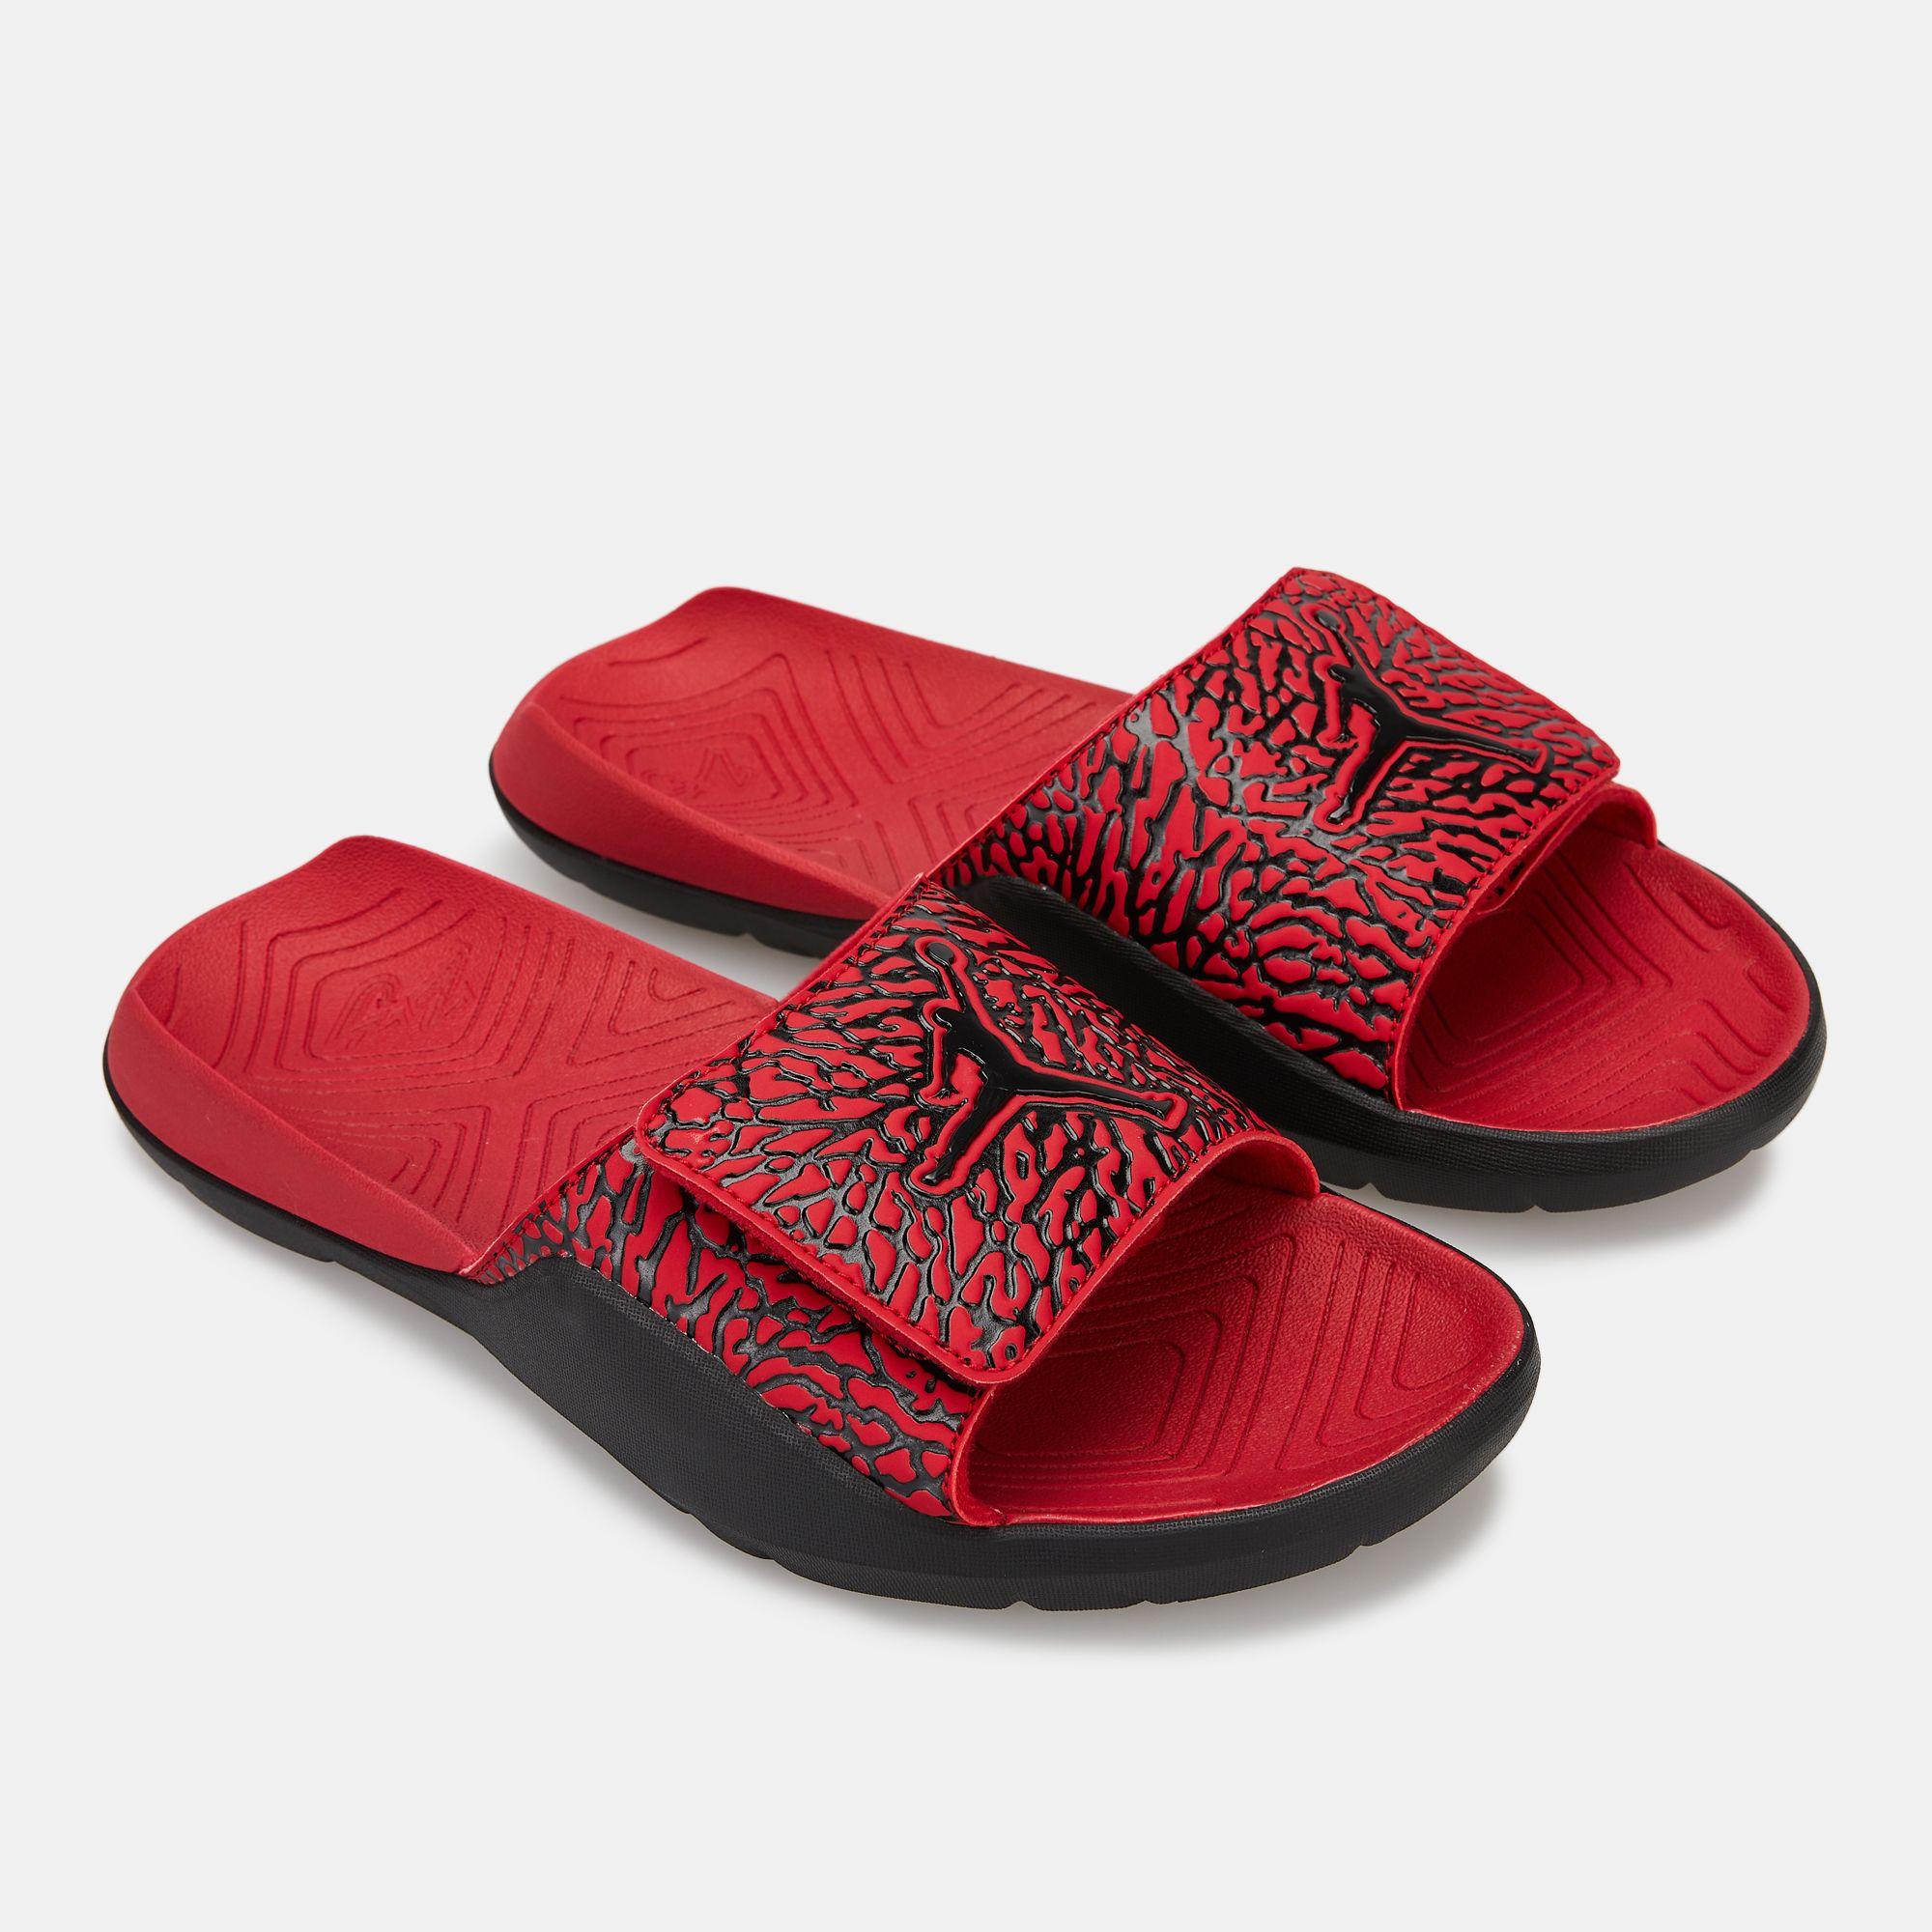 meet 89405 854d7 Jordan Men's Hydro 7 Slides   Slides   Sandals & Flip-Flops ...